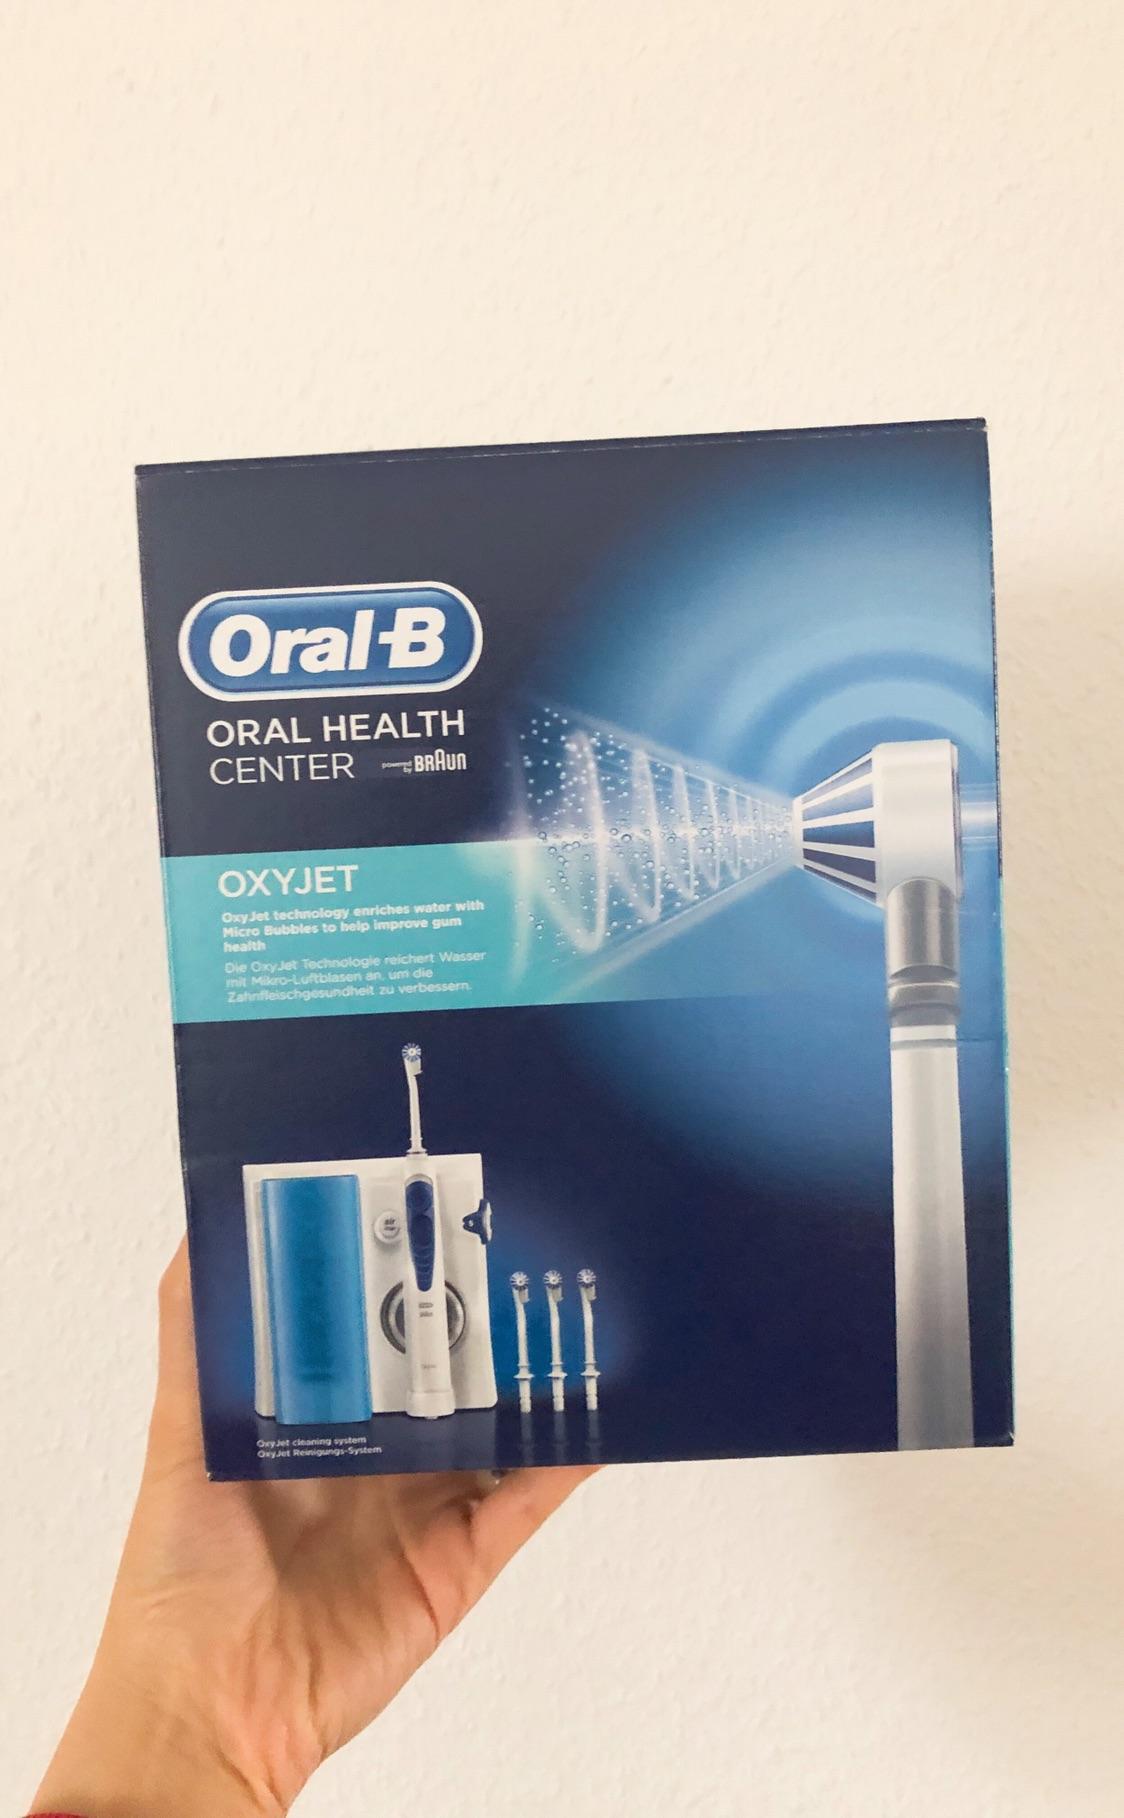 Oral-B Oxyjet 水牙线